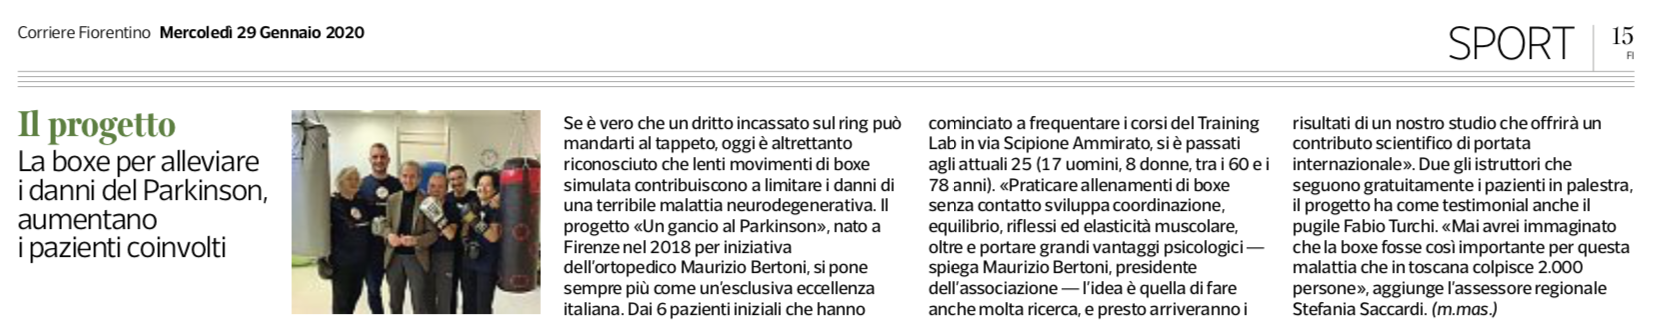 Corriere Fiorentino - Un Gancio Al Parkinson